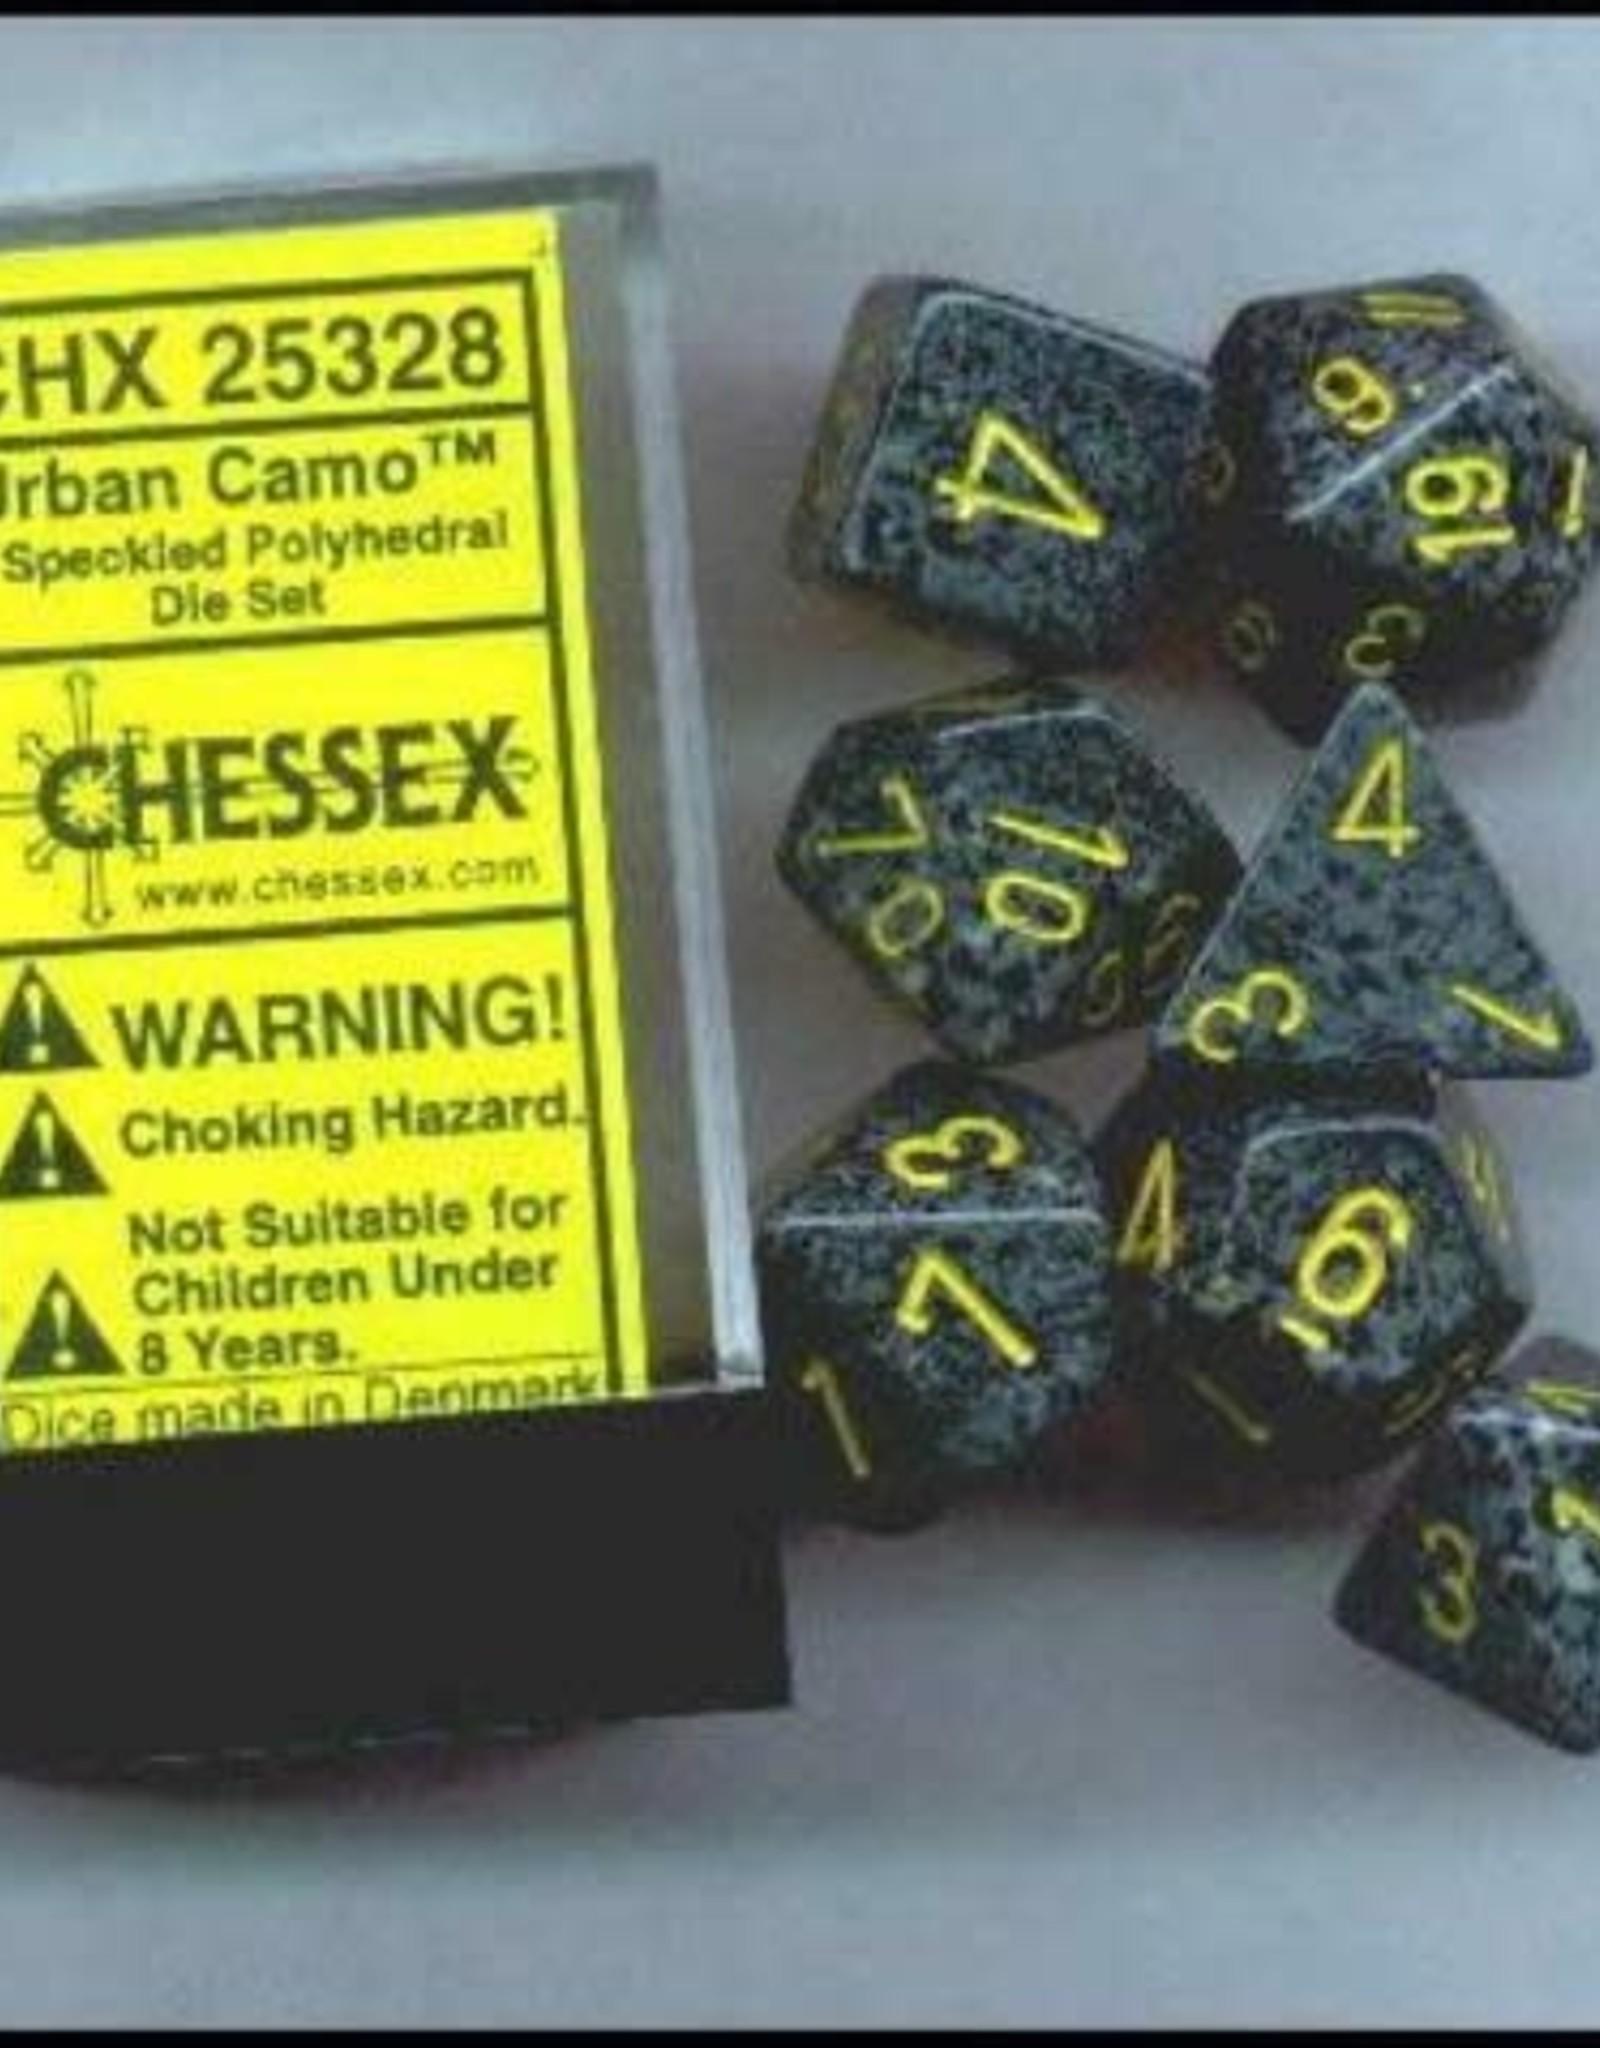 Chessex Dice Block 7ct. - Speckled Urban Camo